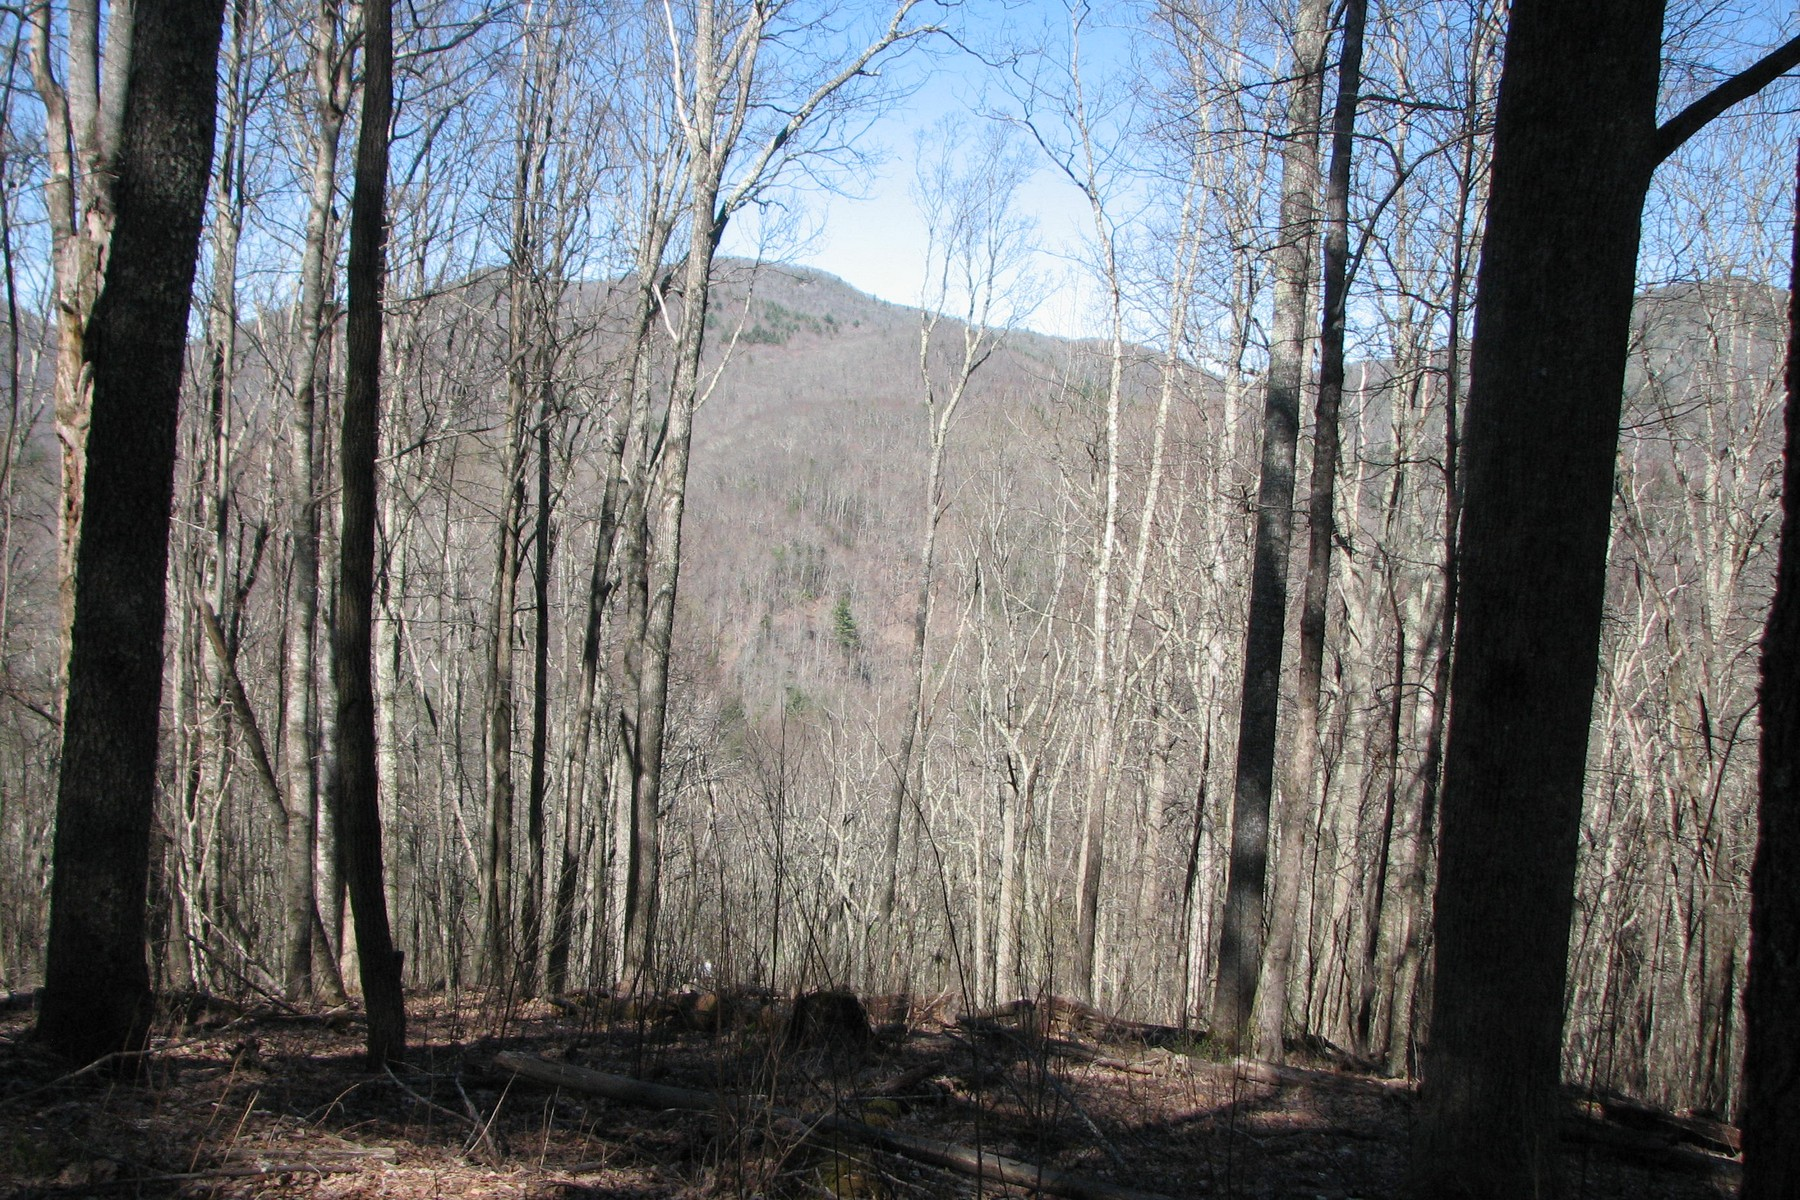 Land for Sale at The Ridges of Highlands Lot 8A Historic Highlands Drive Highlands, North Carolina, 28741 United States